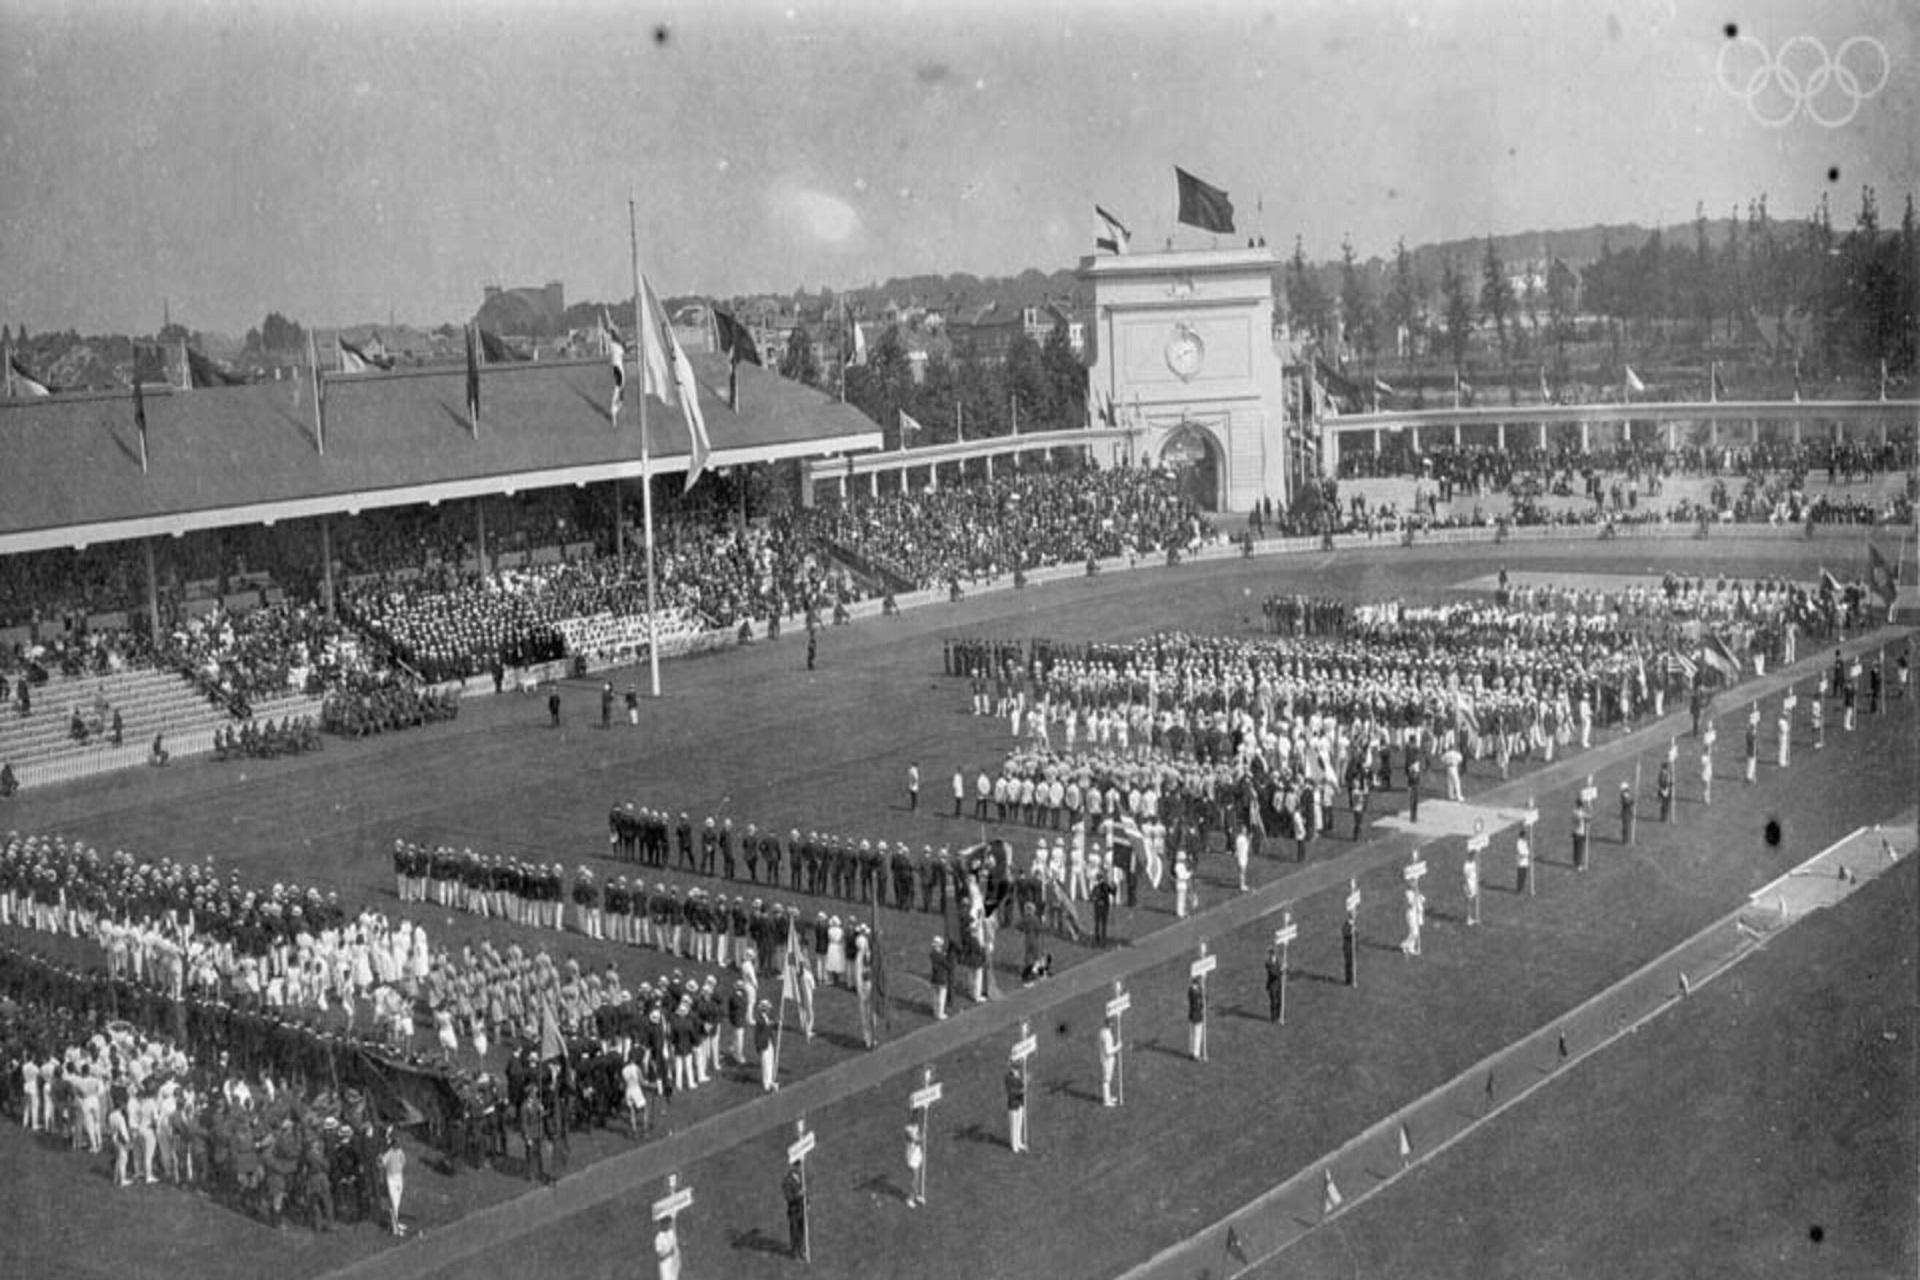 Abertura dos Jogos Olímpicos de Antuérpia 1920 (Estádio Olímpico).